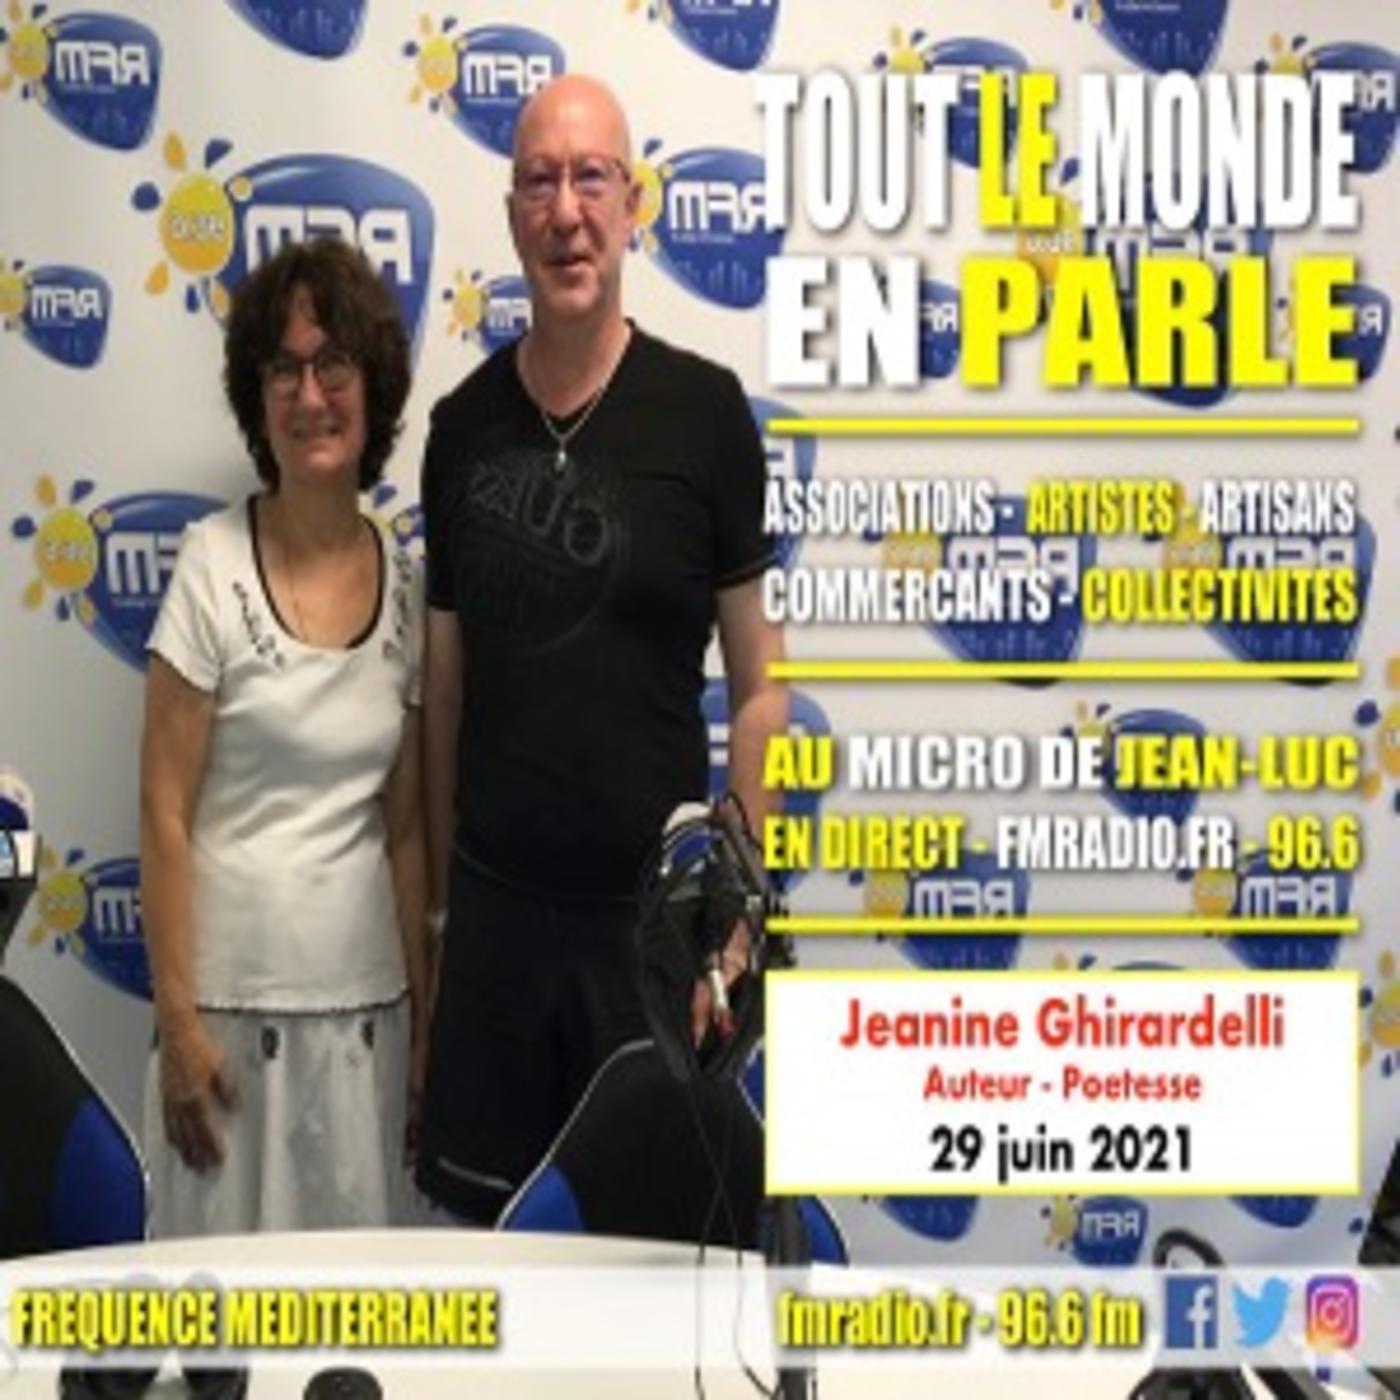 Invitée - Jeanine Ghiradelli